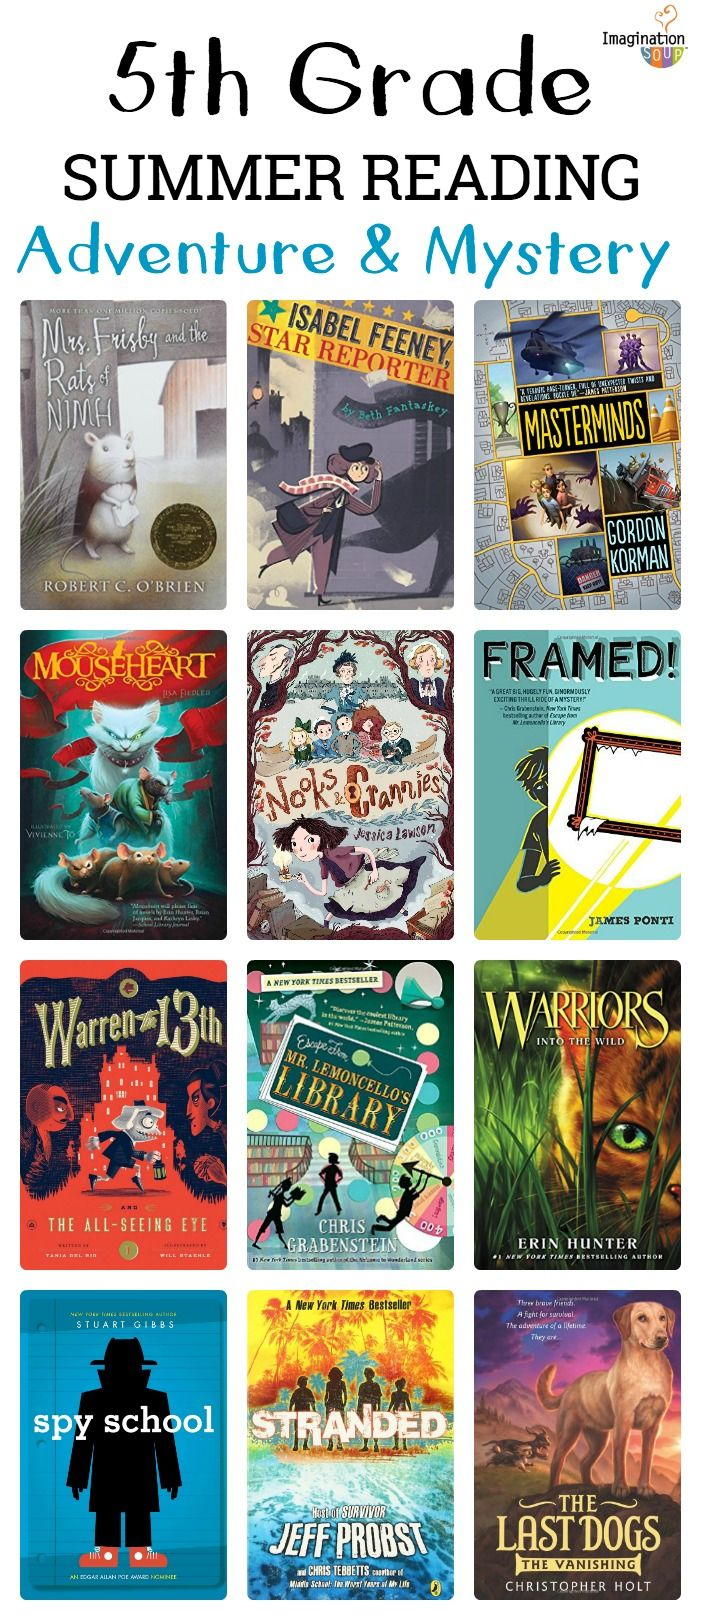 5th Grade Summer Reading List Ages 10 11 Kids Summer Reading Summer Reading Lists Books For Tweens